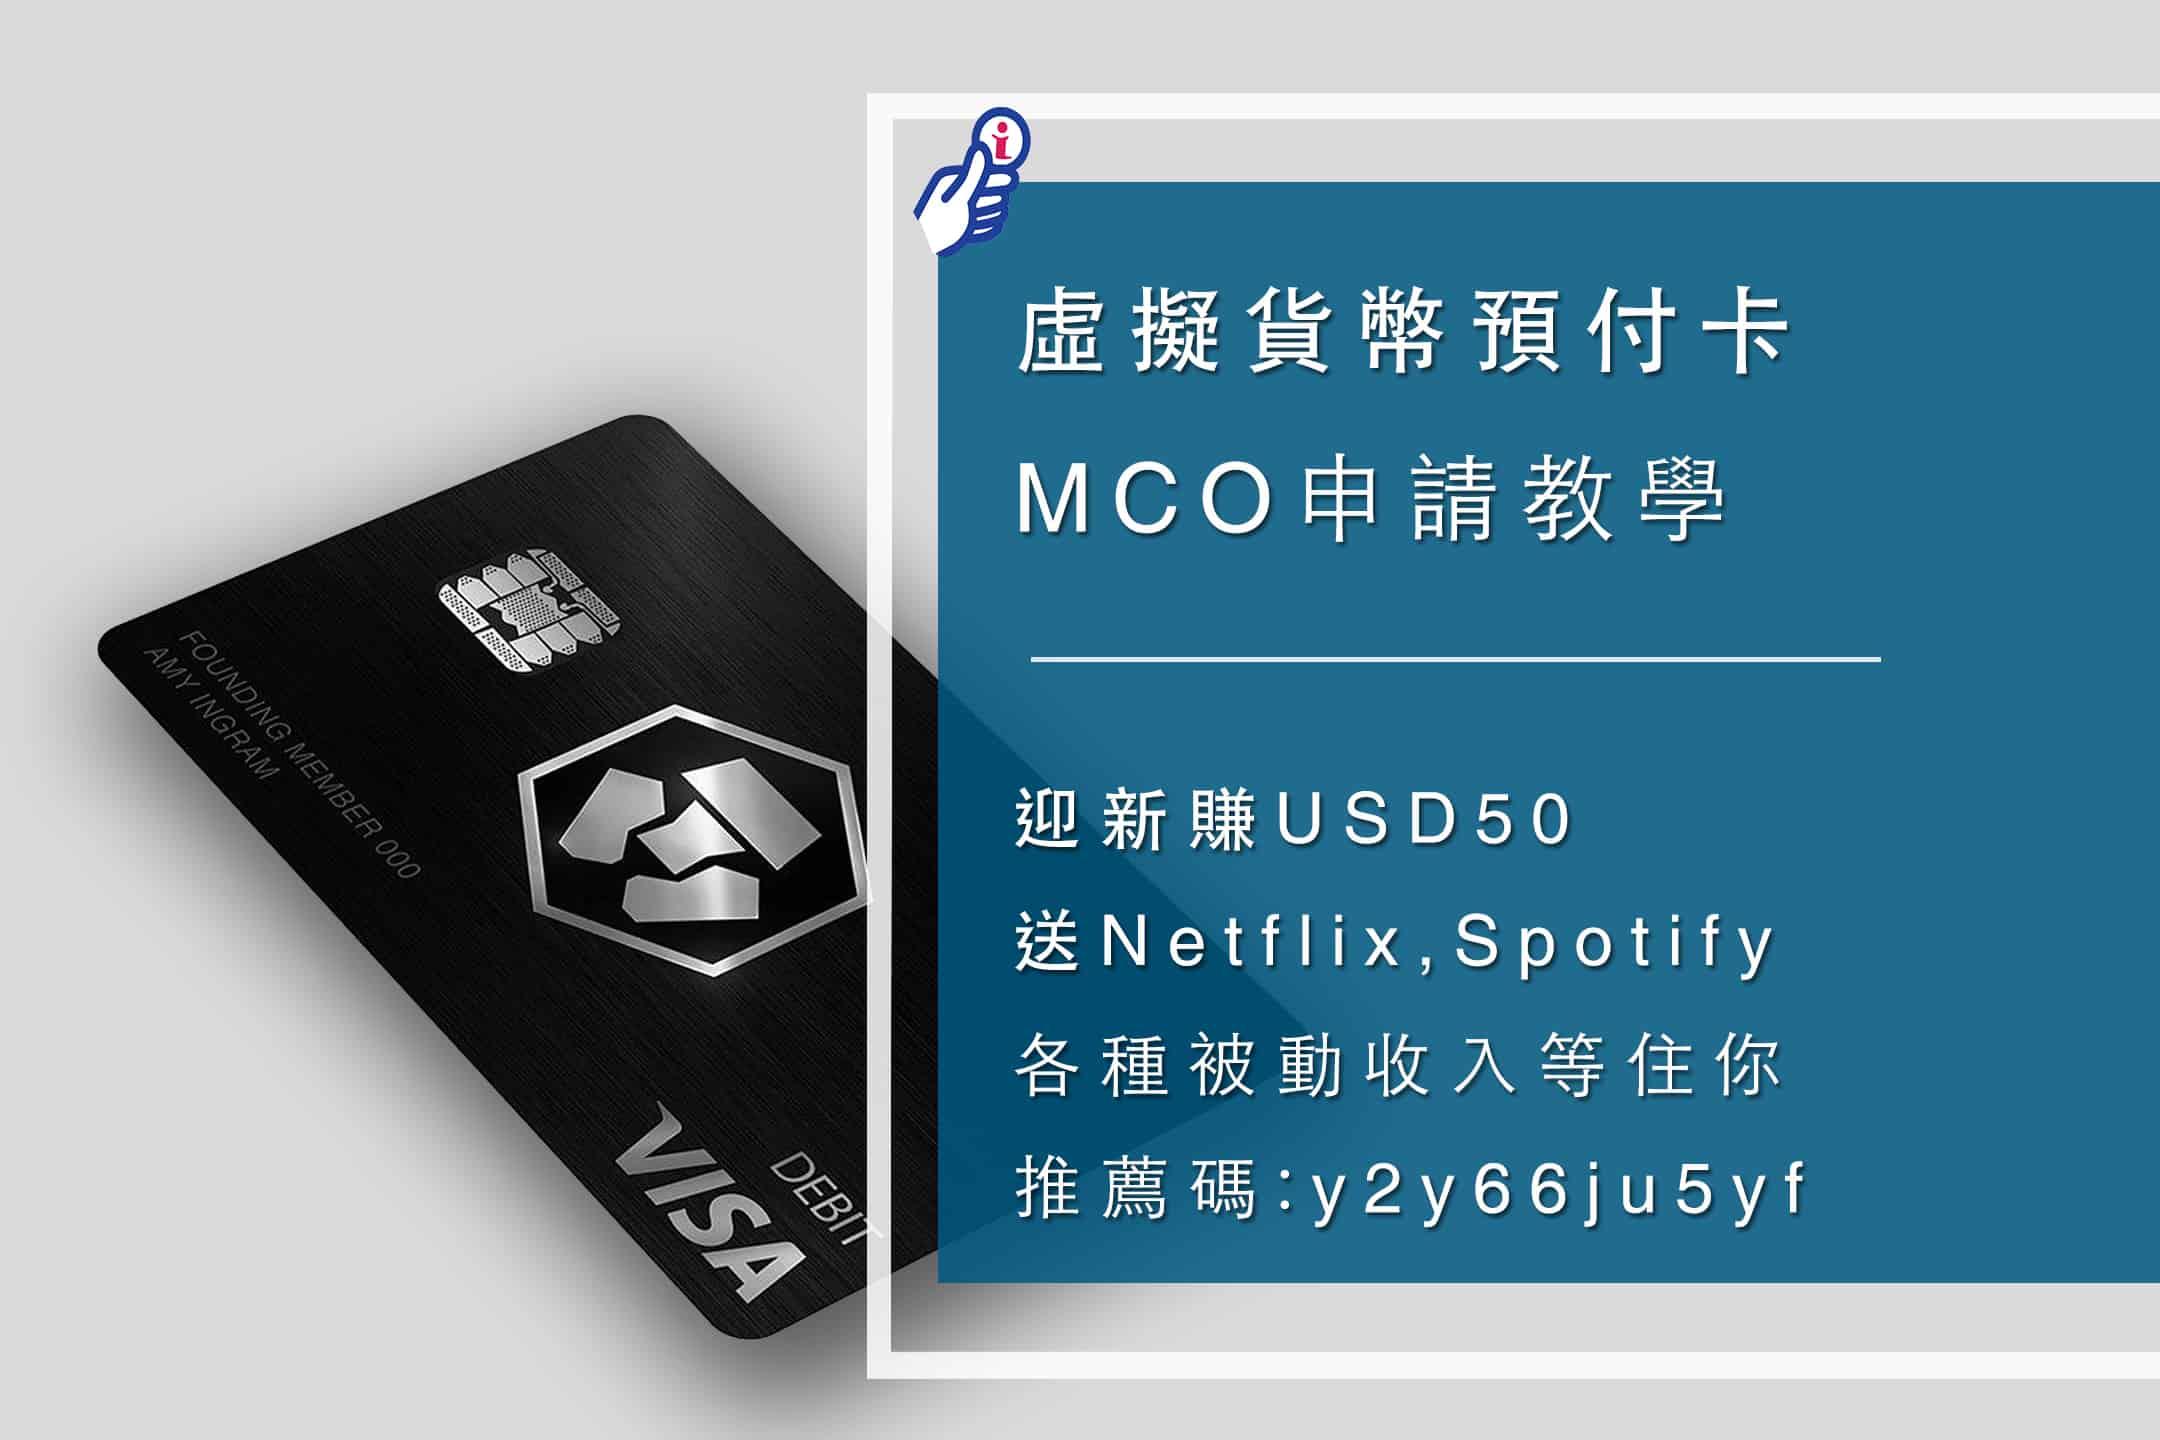 【MCO VISA Debit Card 虛擬貨幣預付卡】迎新賺USD50!送免費Netflix同Spotify!仲有Hktvmall 10%回贈!(2020-07-12 更新) | 港 ...